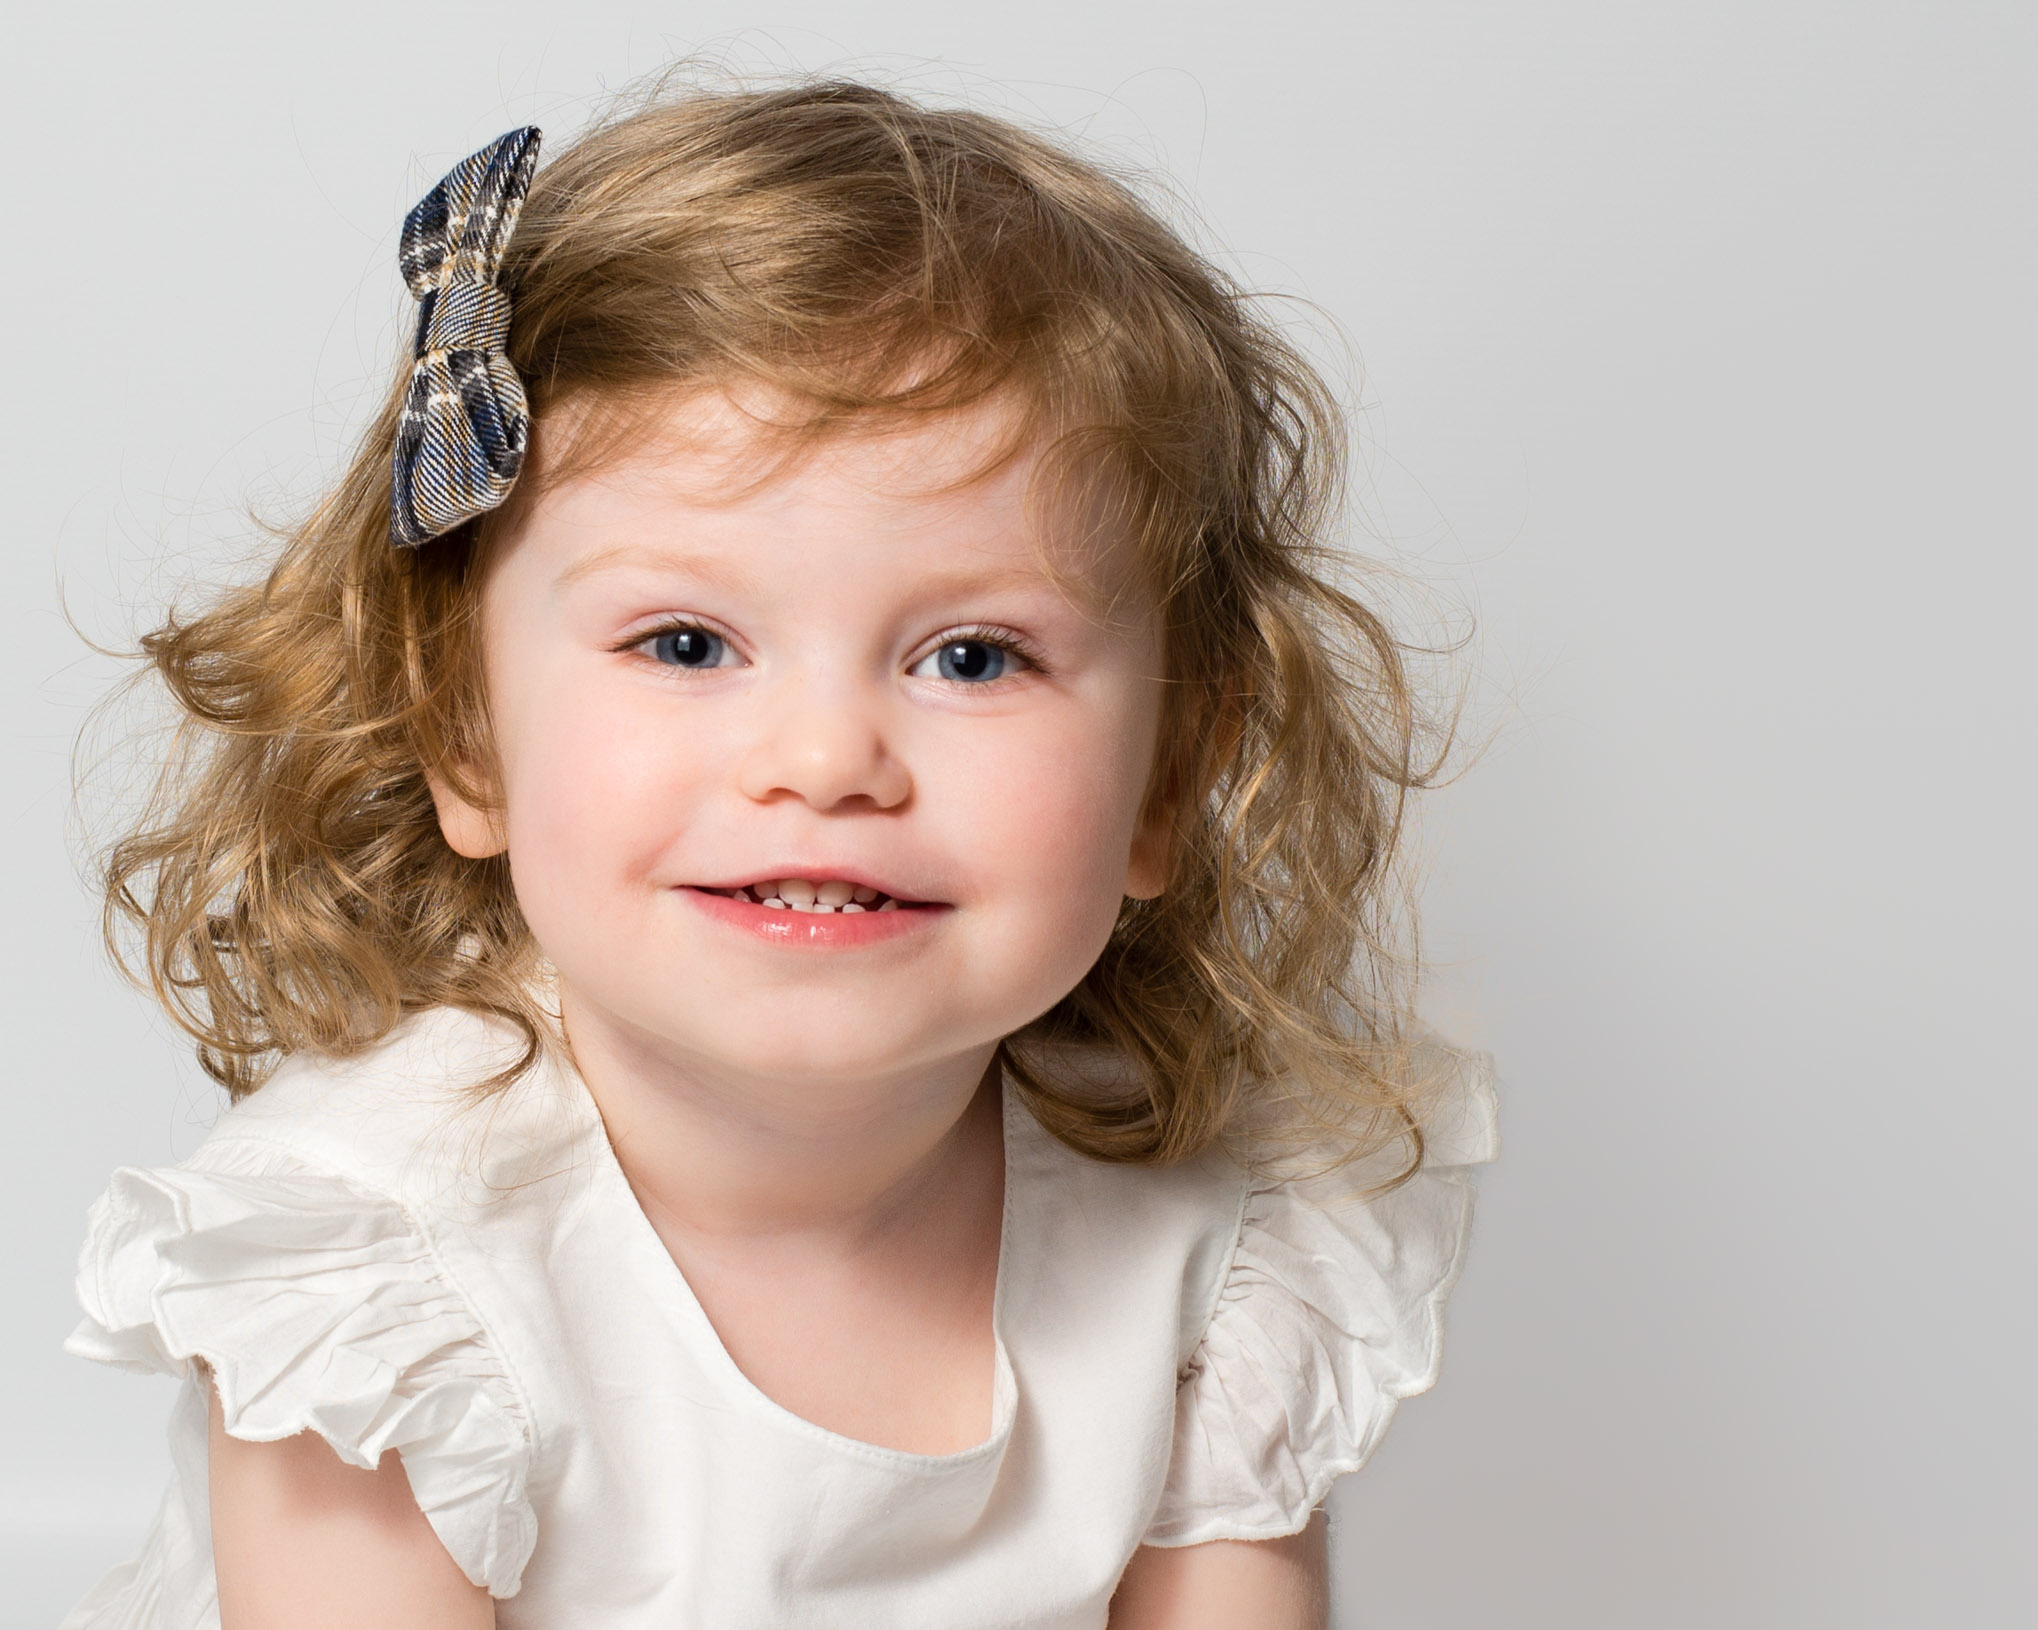 Toddler studio headshot | Children's Photography